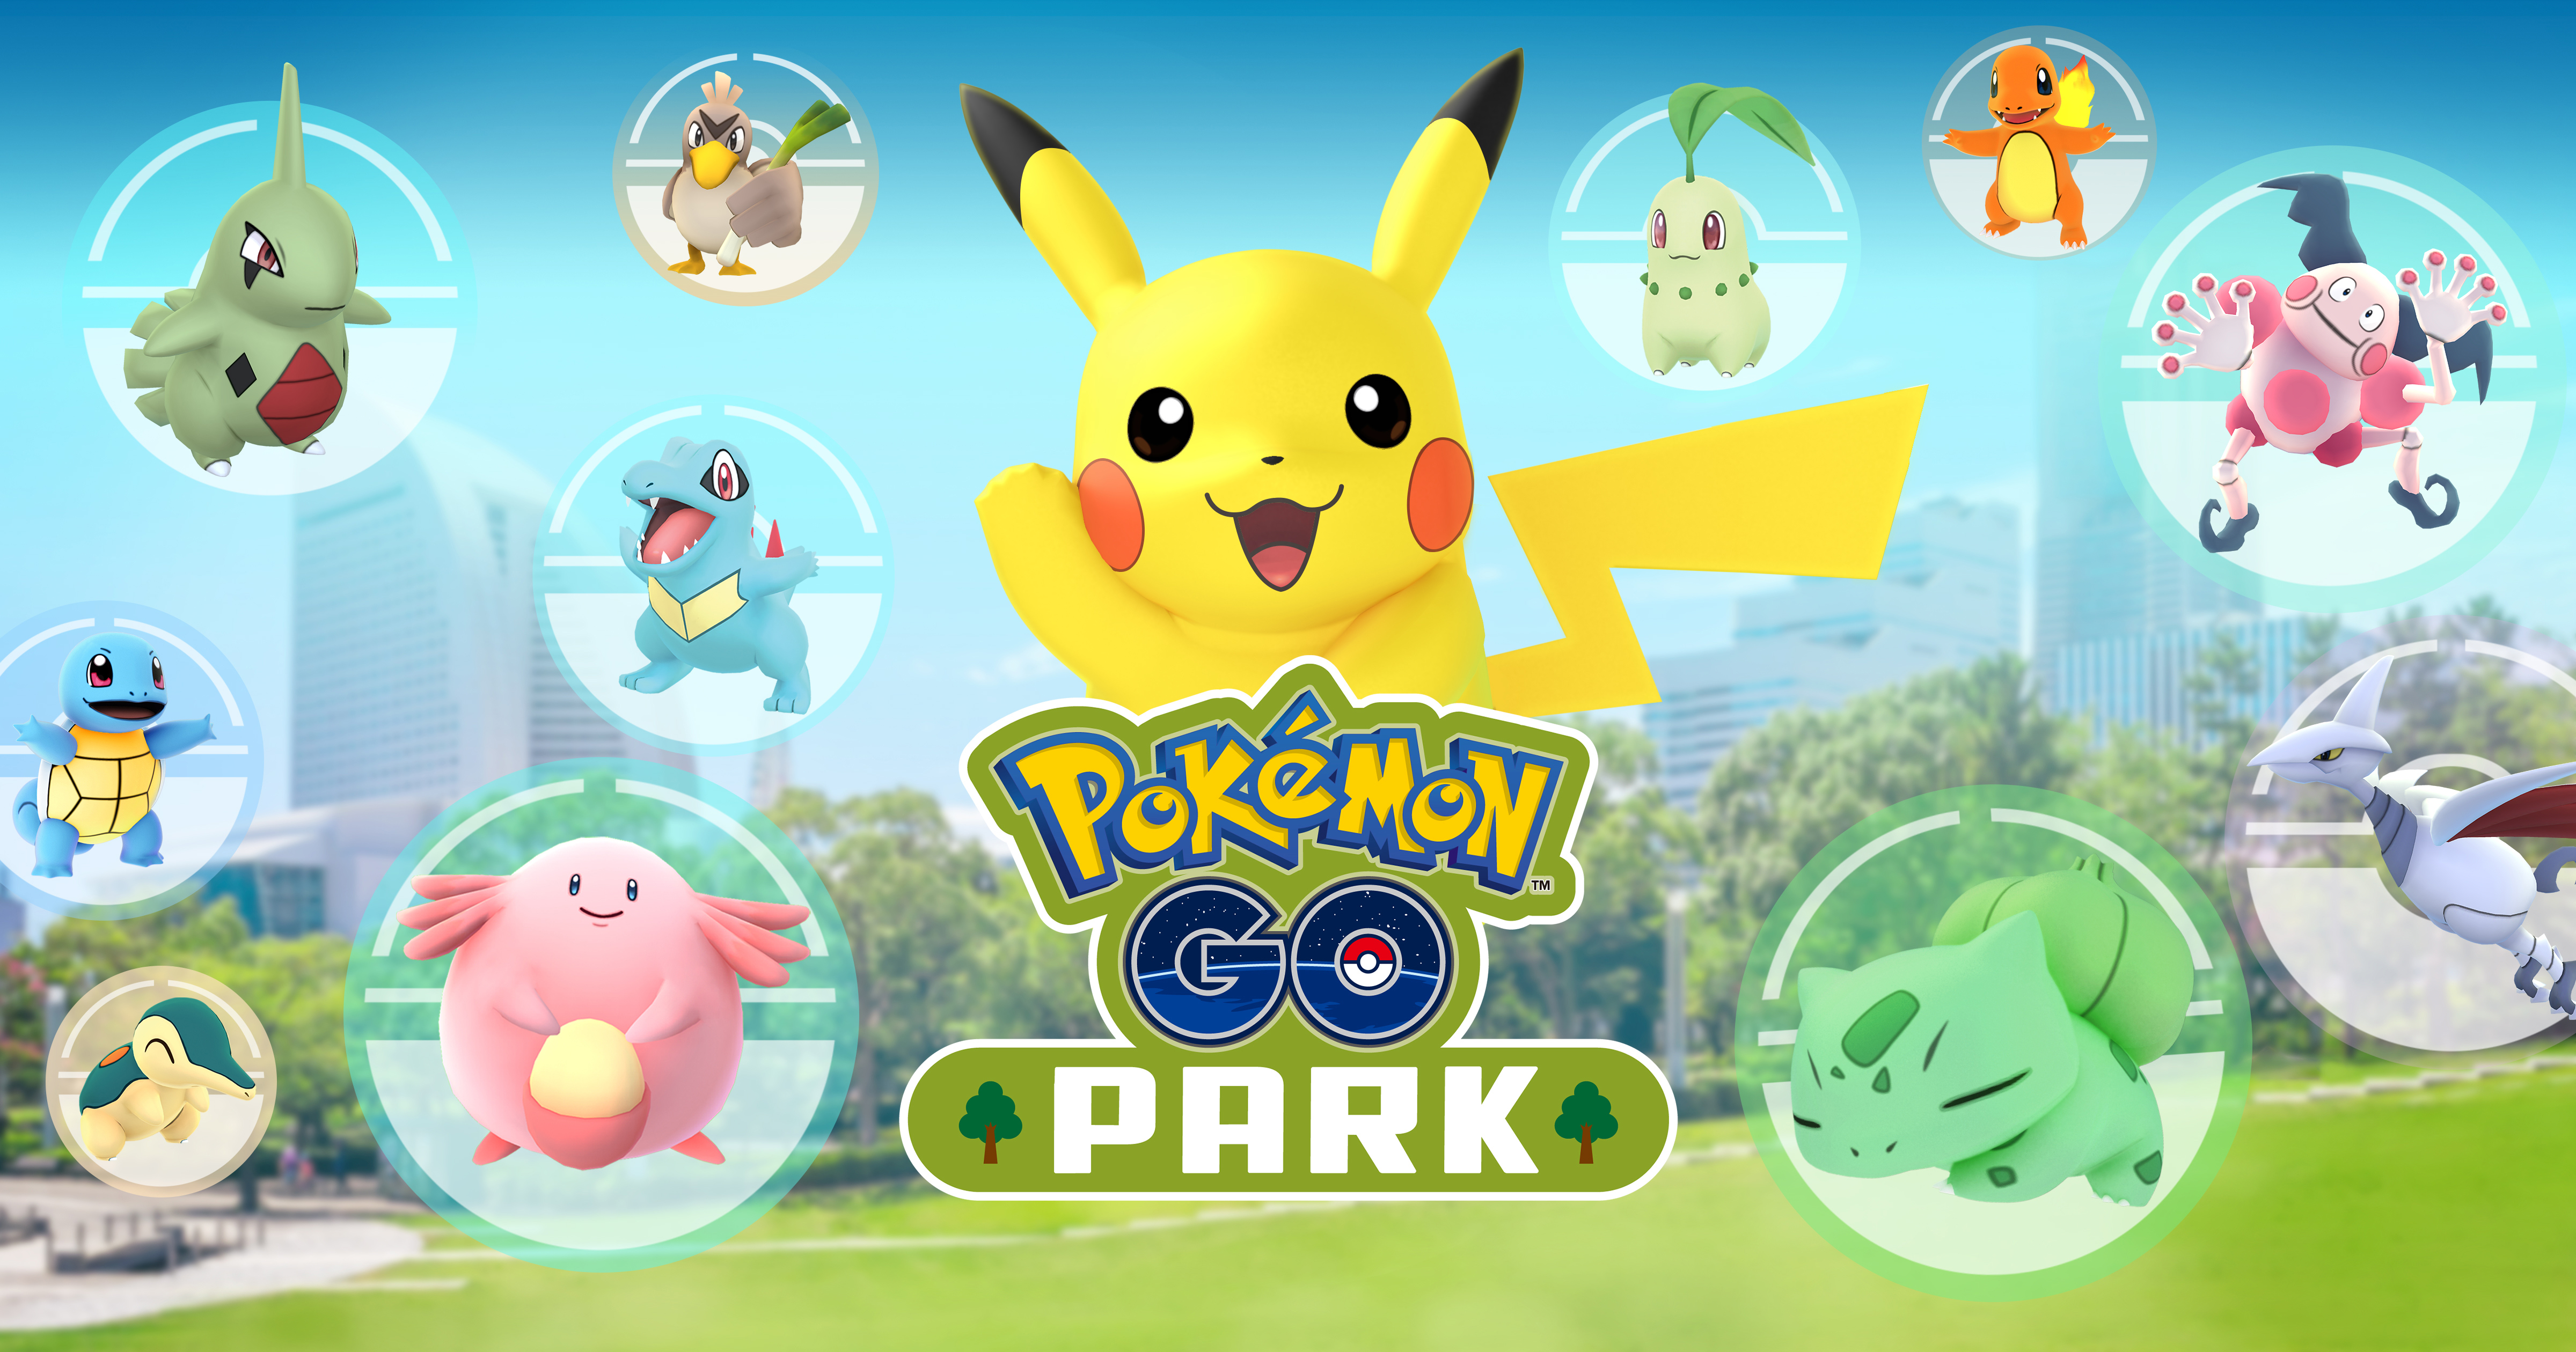 Pokemon GO pgsharp fake locations